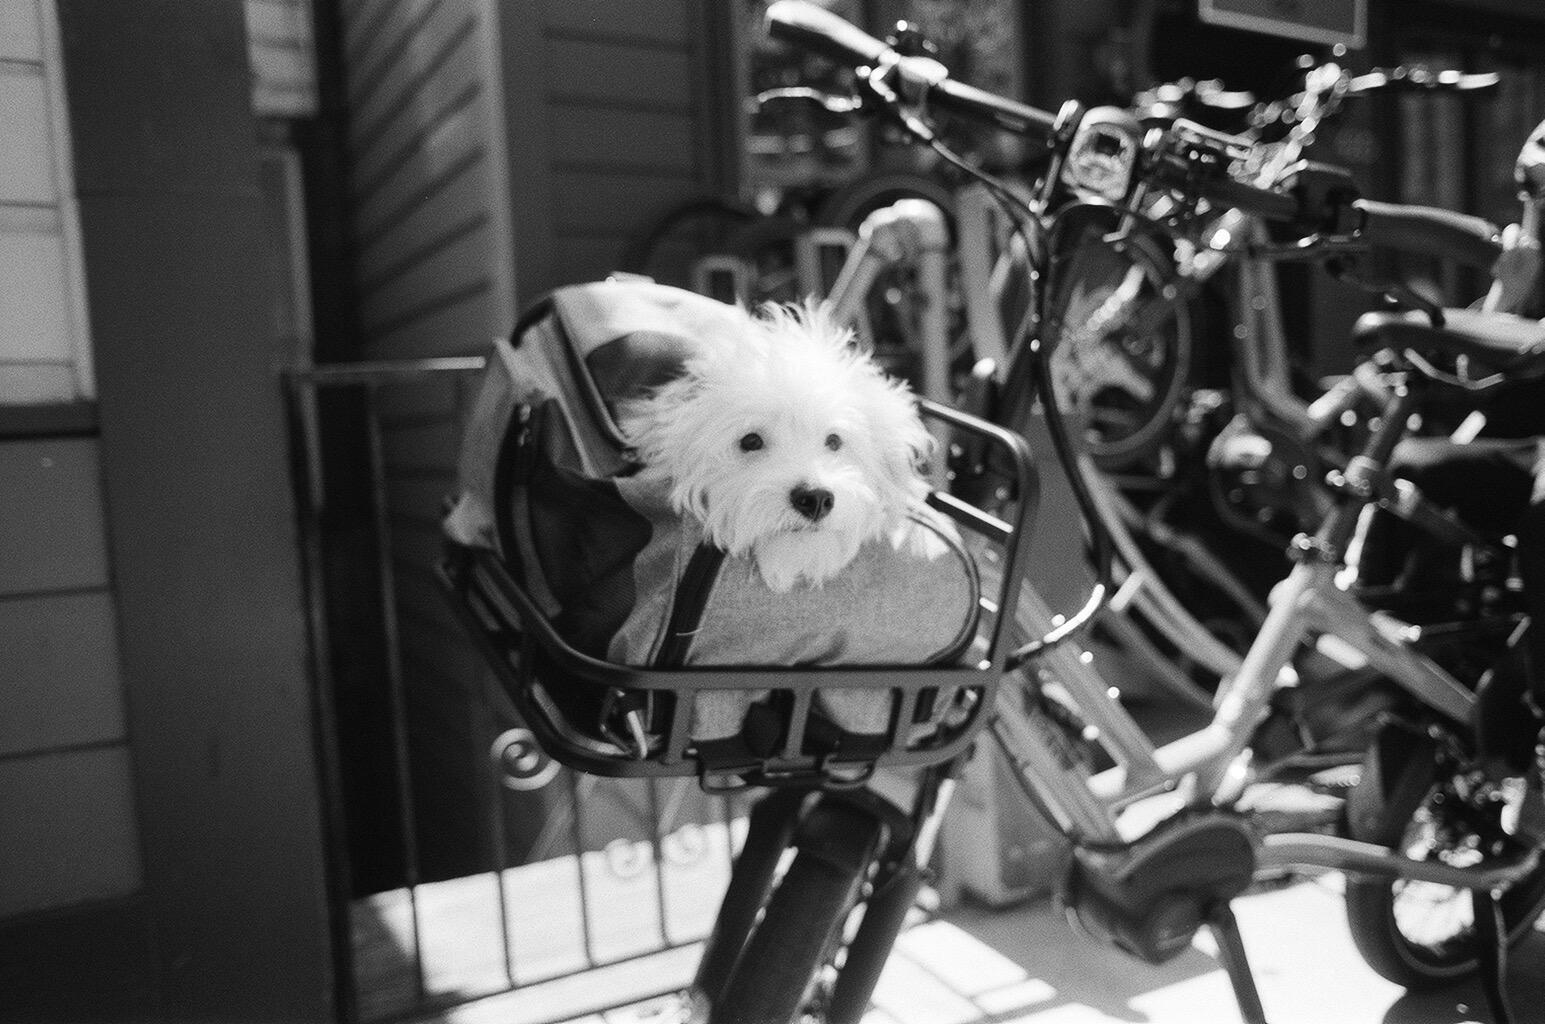 Dog on a bike, May 2021, Bernal Heights, San Francisco